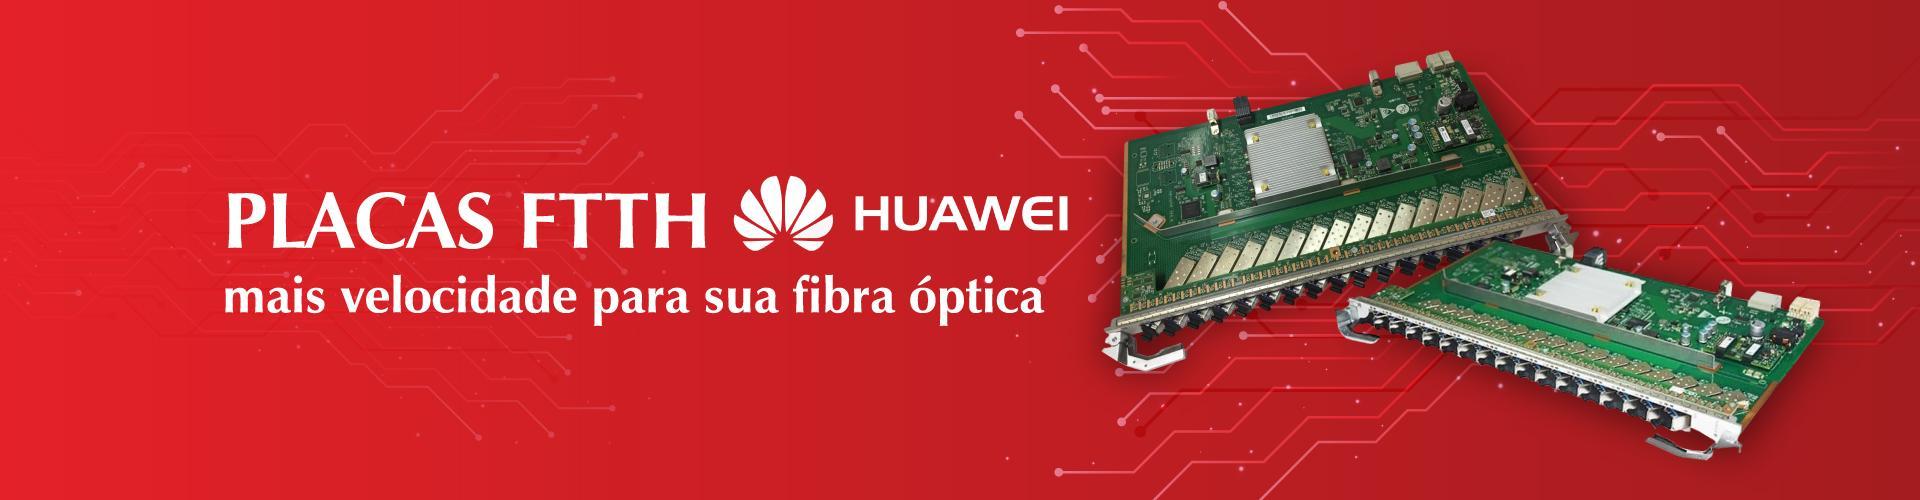 Placas FTTH Huawei